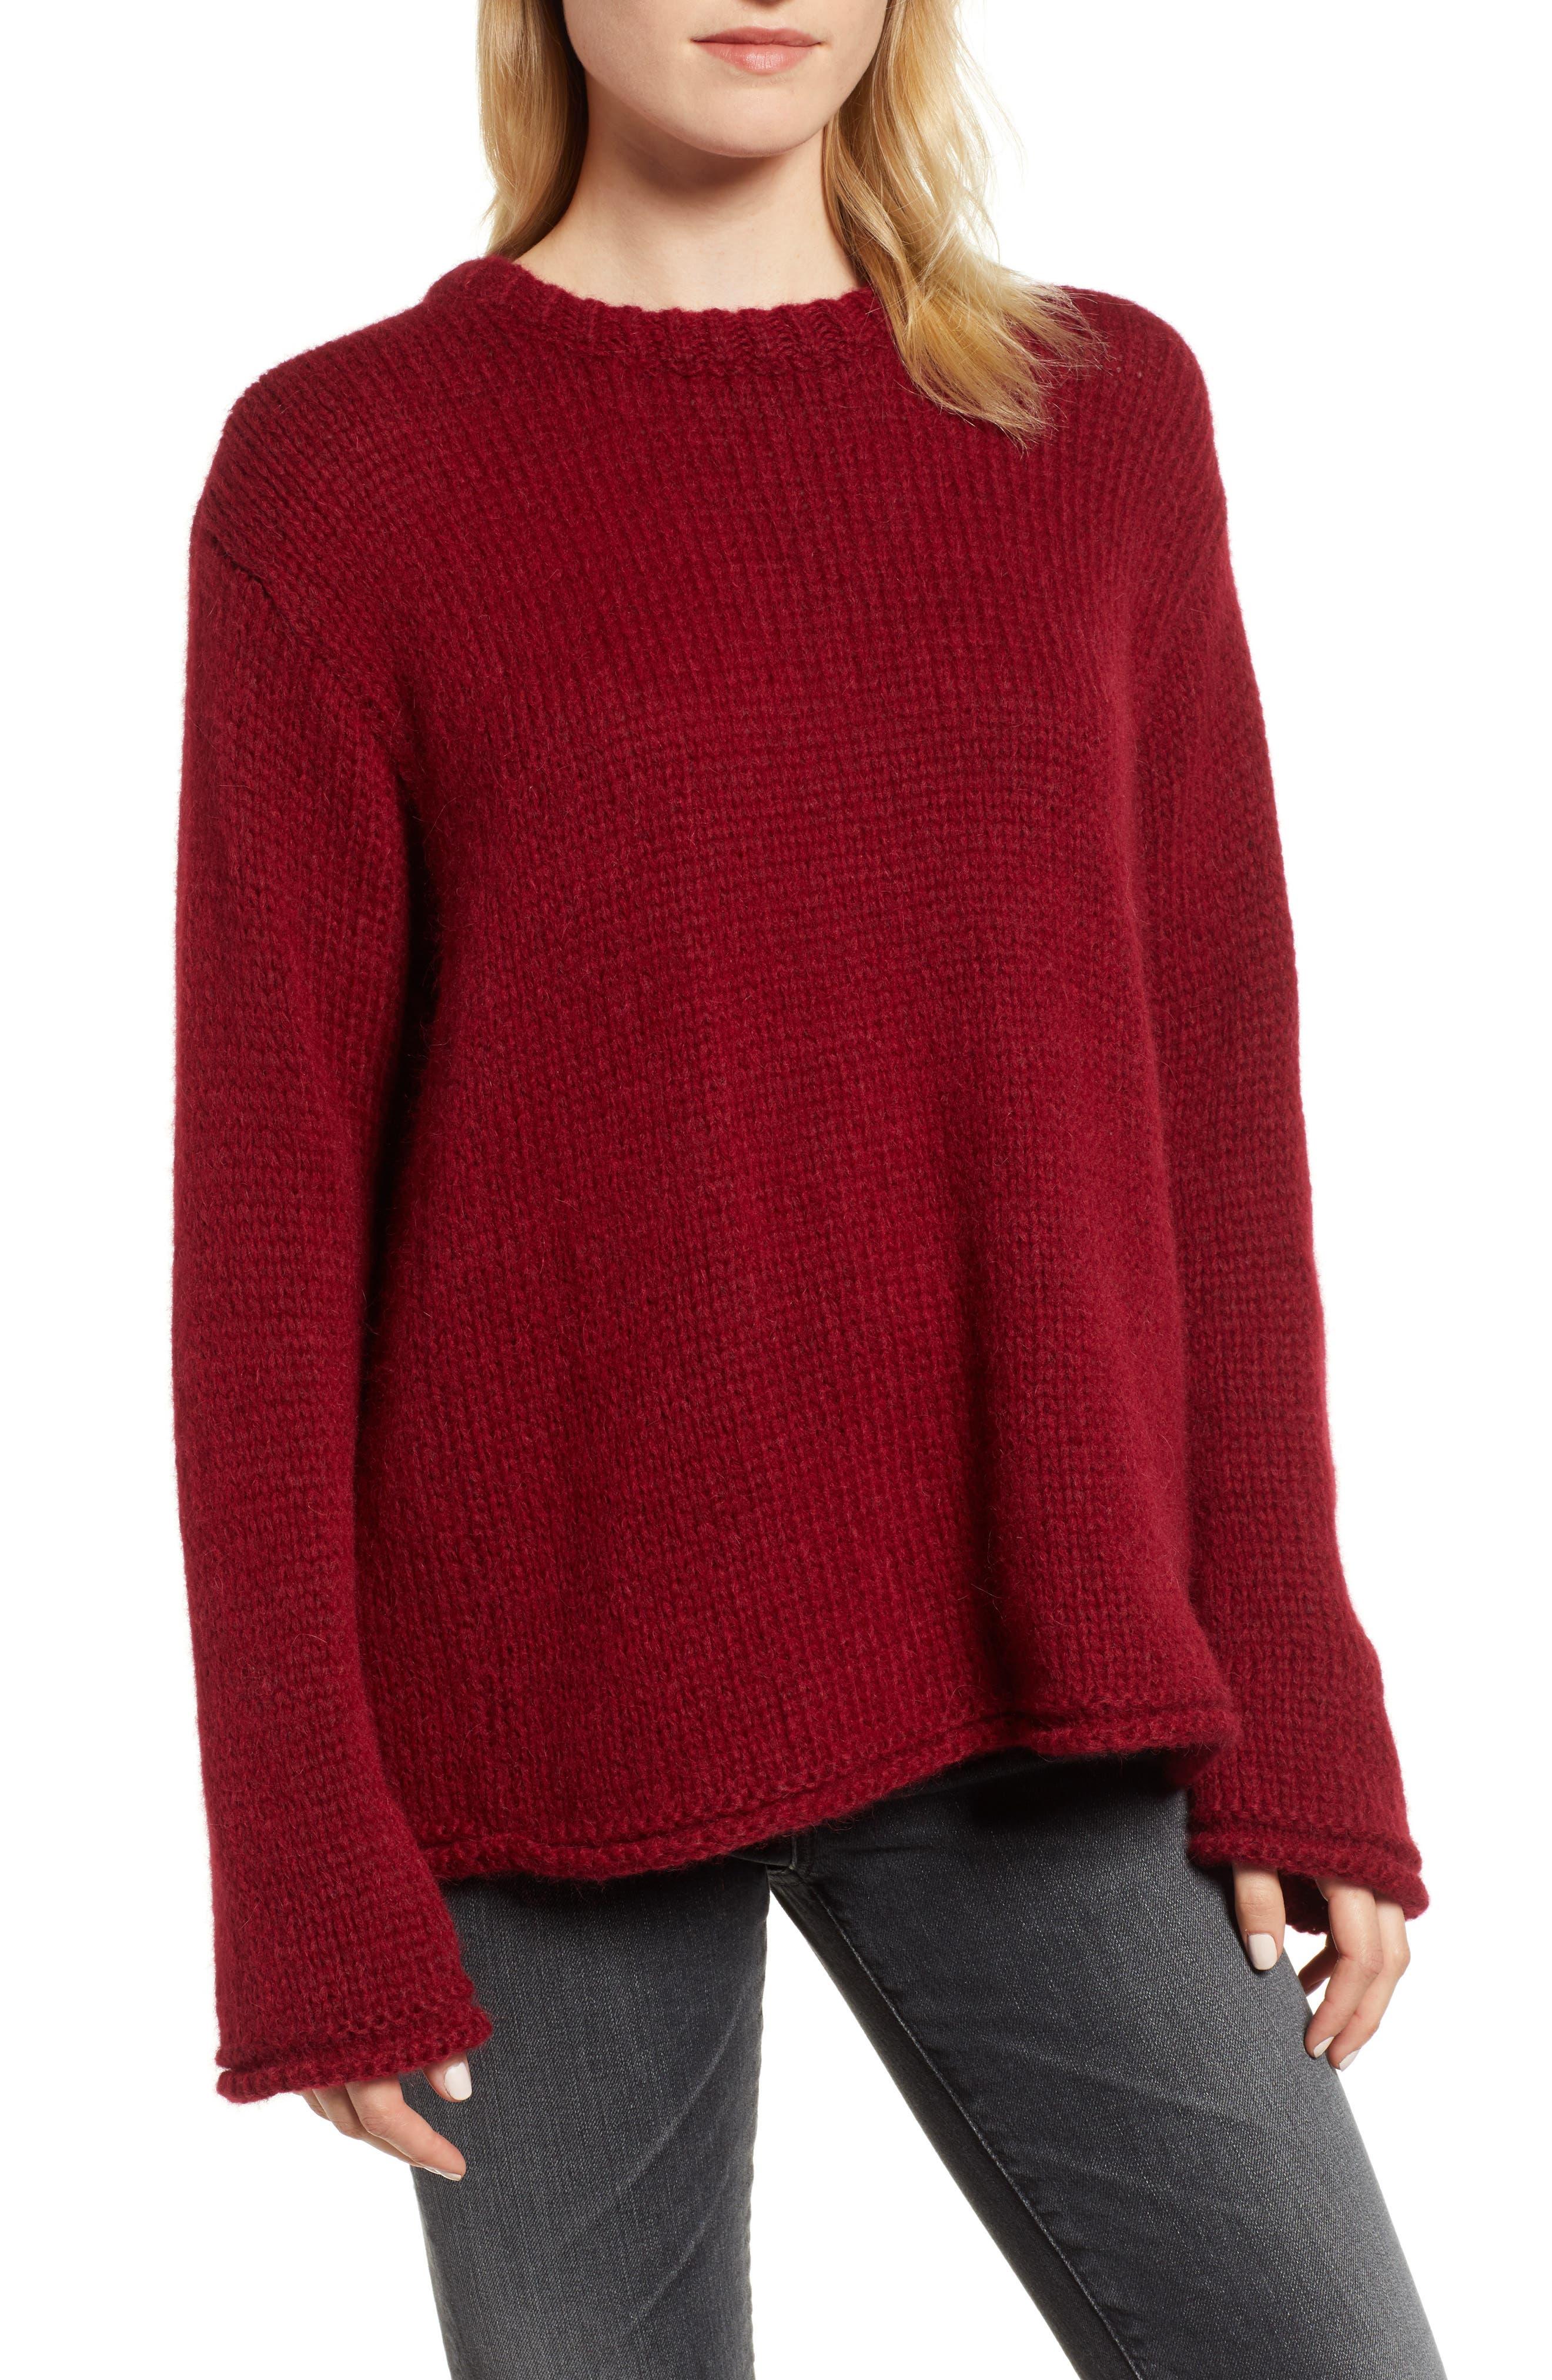 Velvet By Graham & Spencer Wool Alpaca Blend Crewneck Sweater, Red